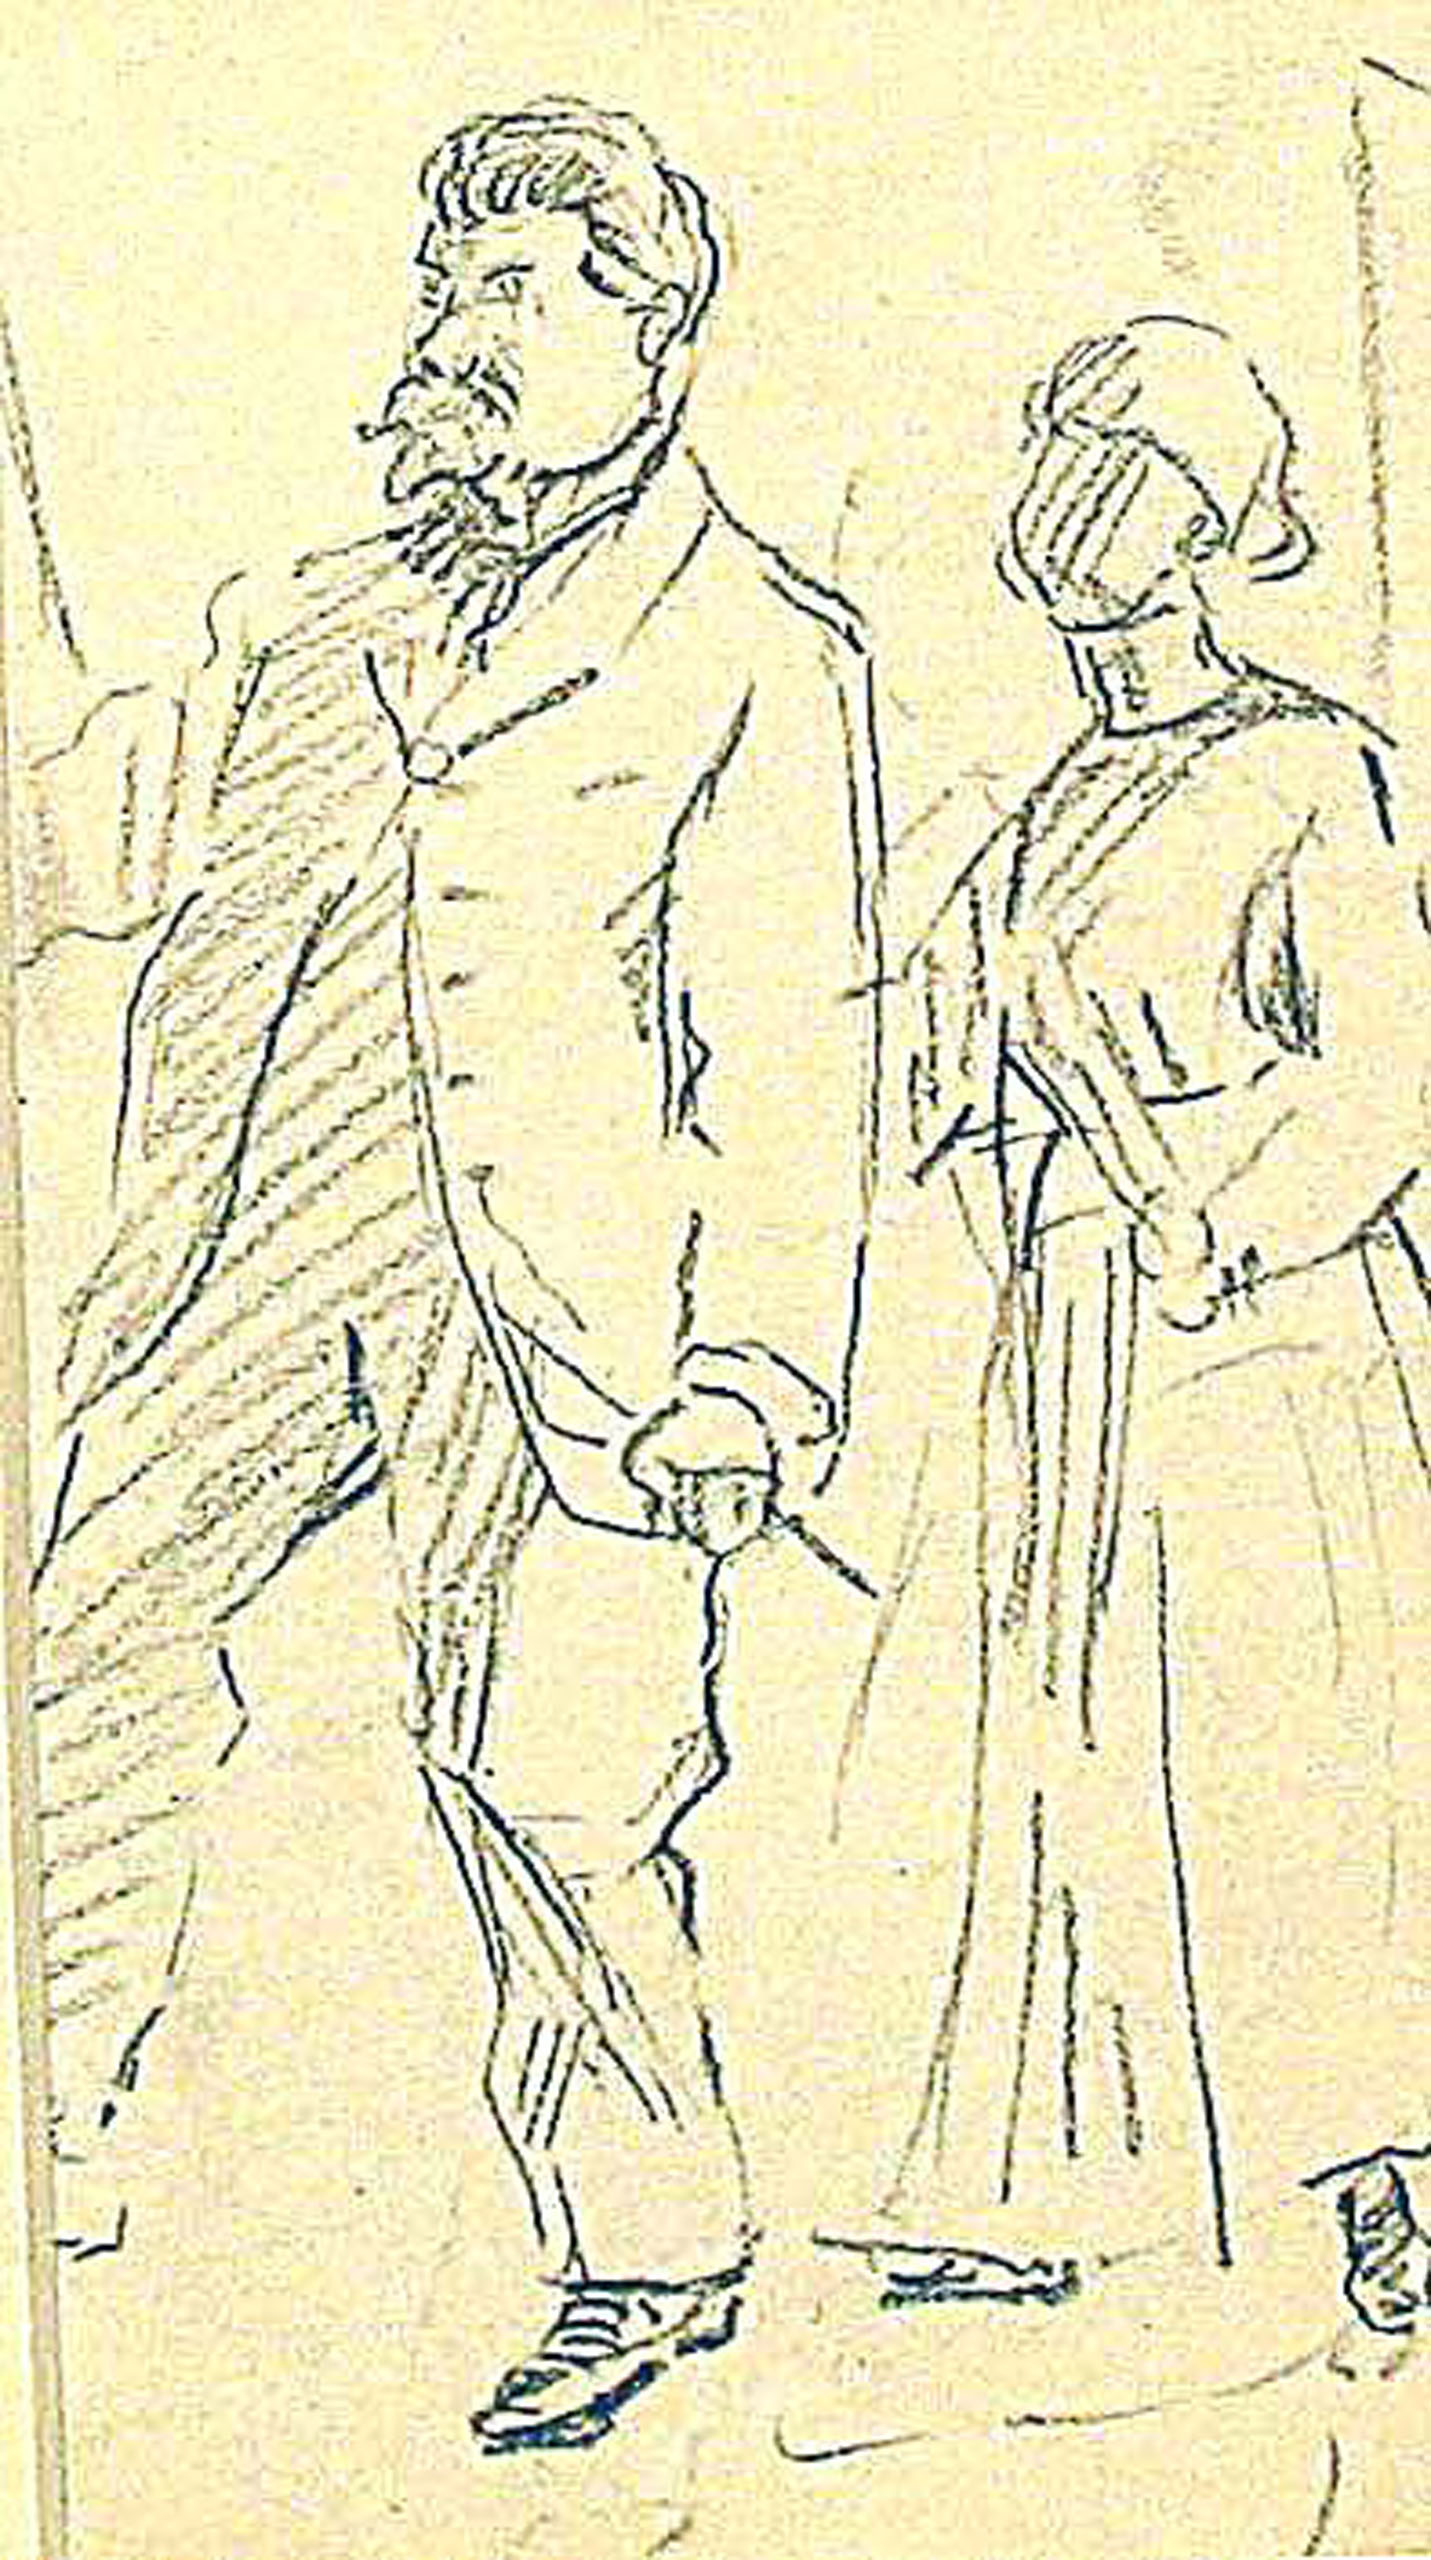 Mary Swanzy_-_Gentleman Drawing.jpg